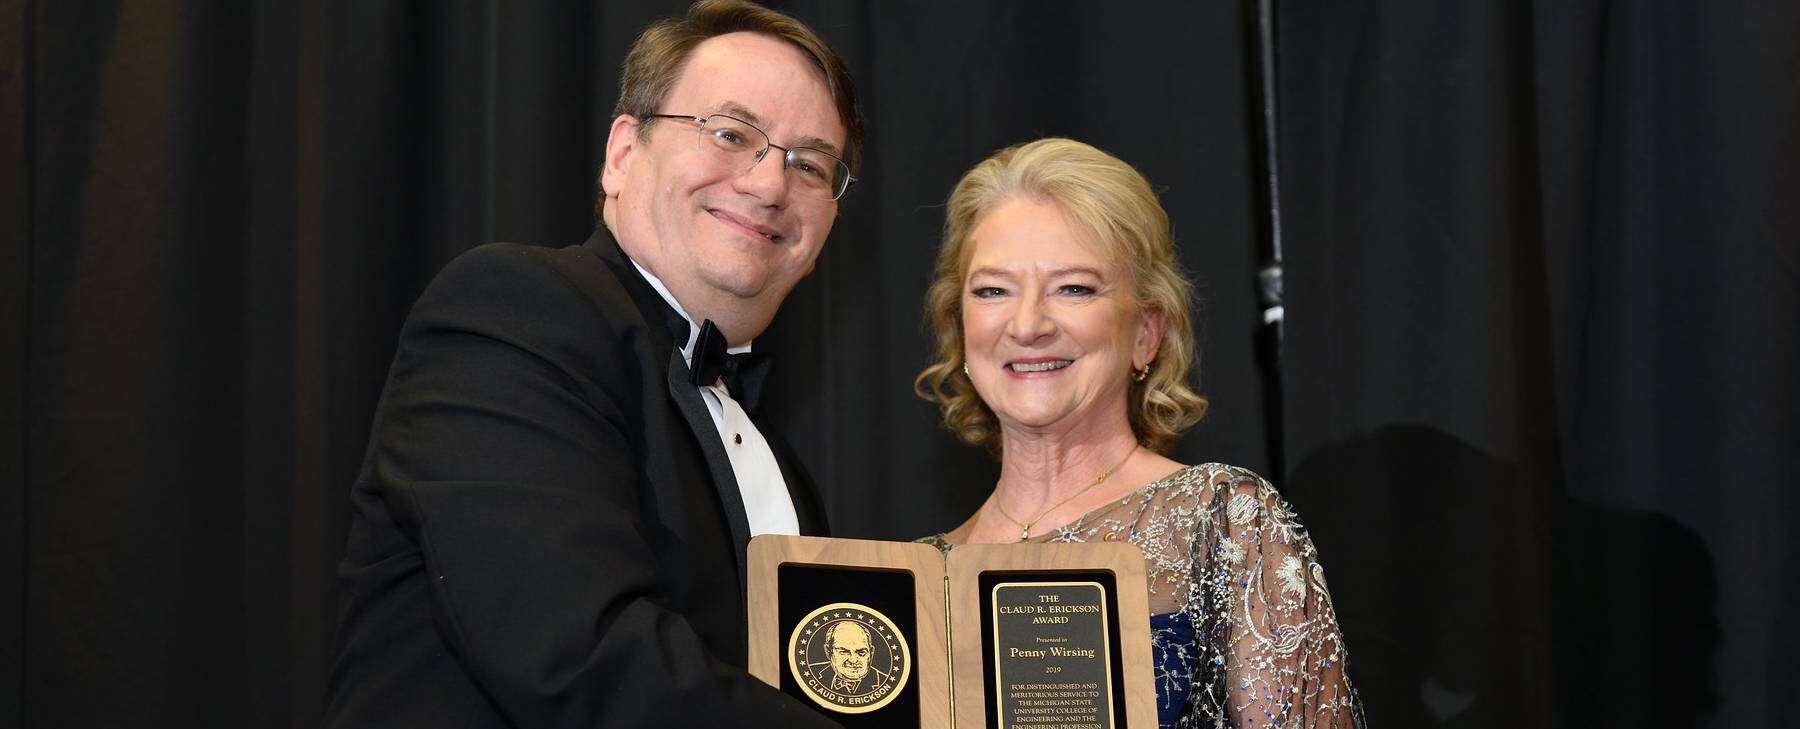 Penny Wirsing holding MSU distinguished alumni award